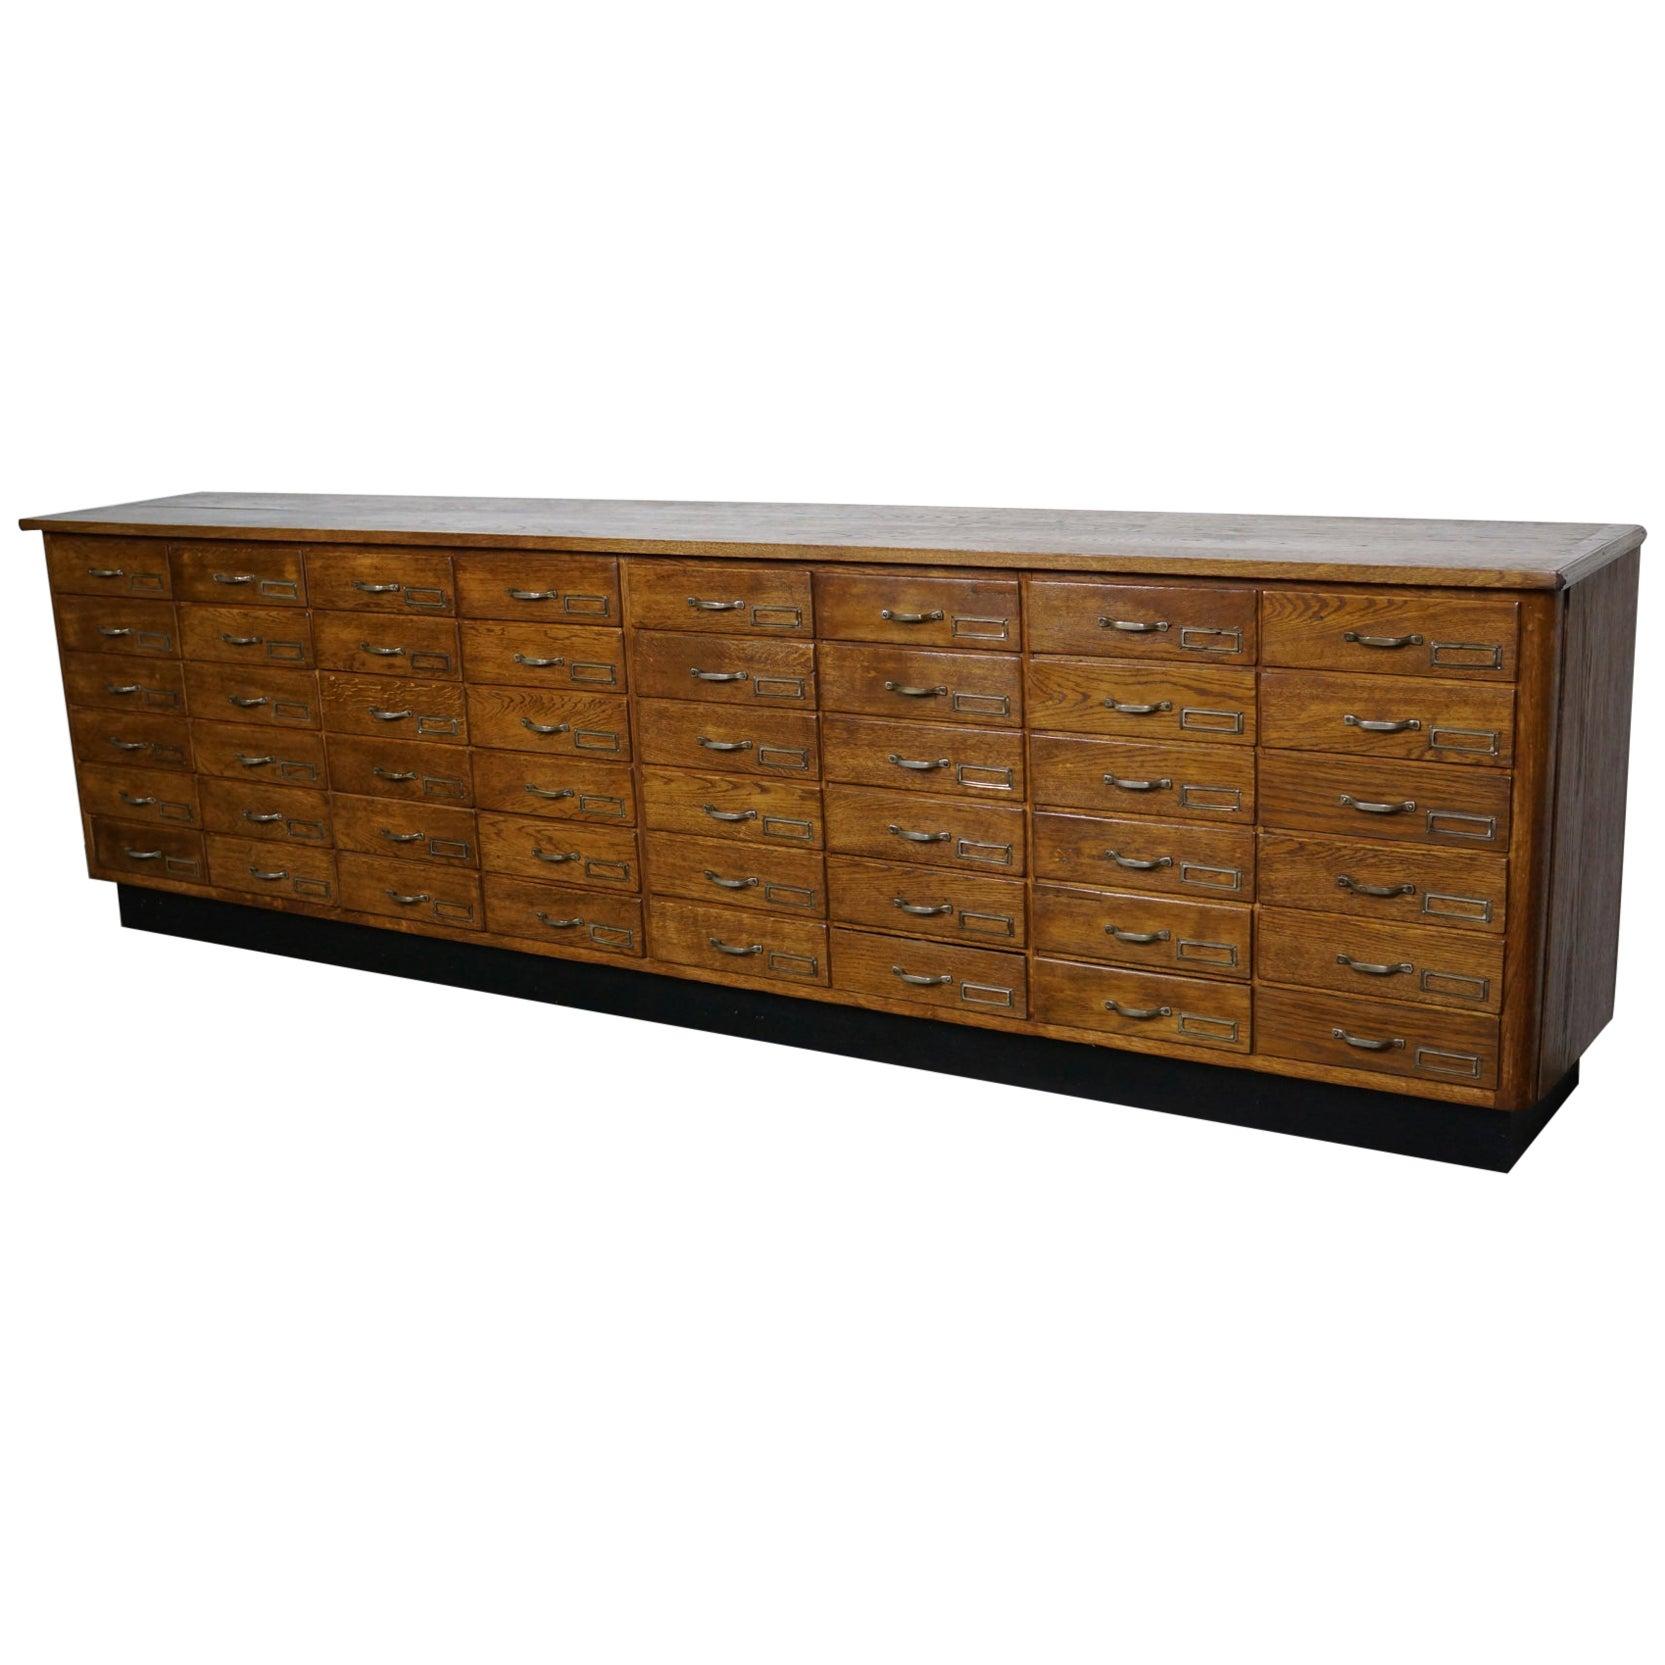 Large Dutch Oak Apothecary Cabinet, 1940s